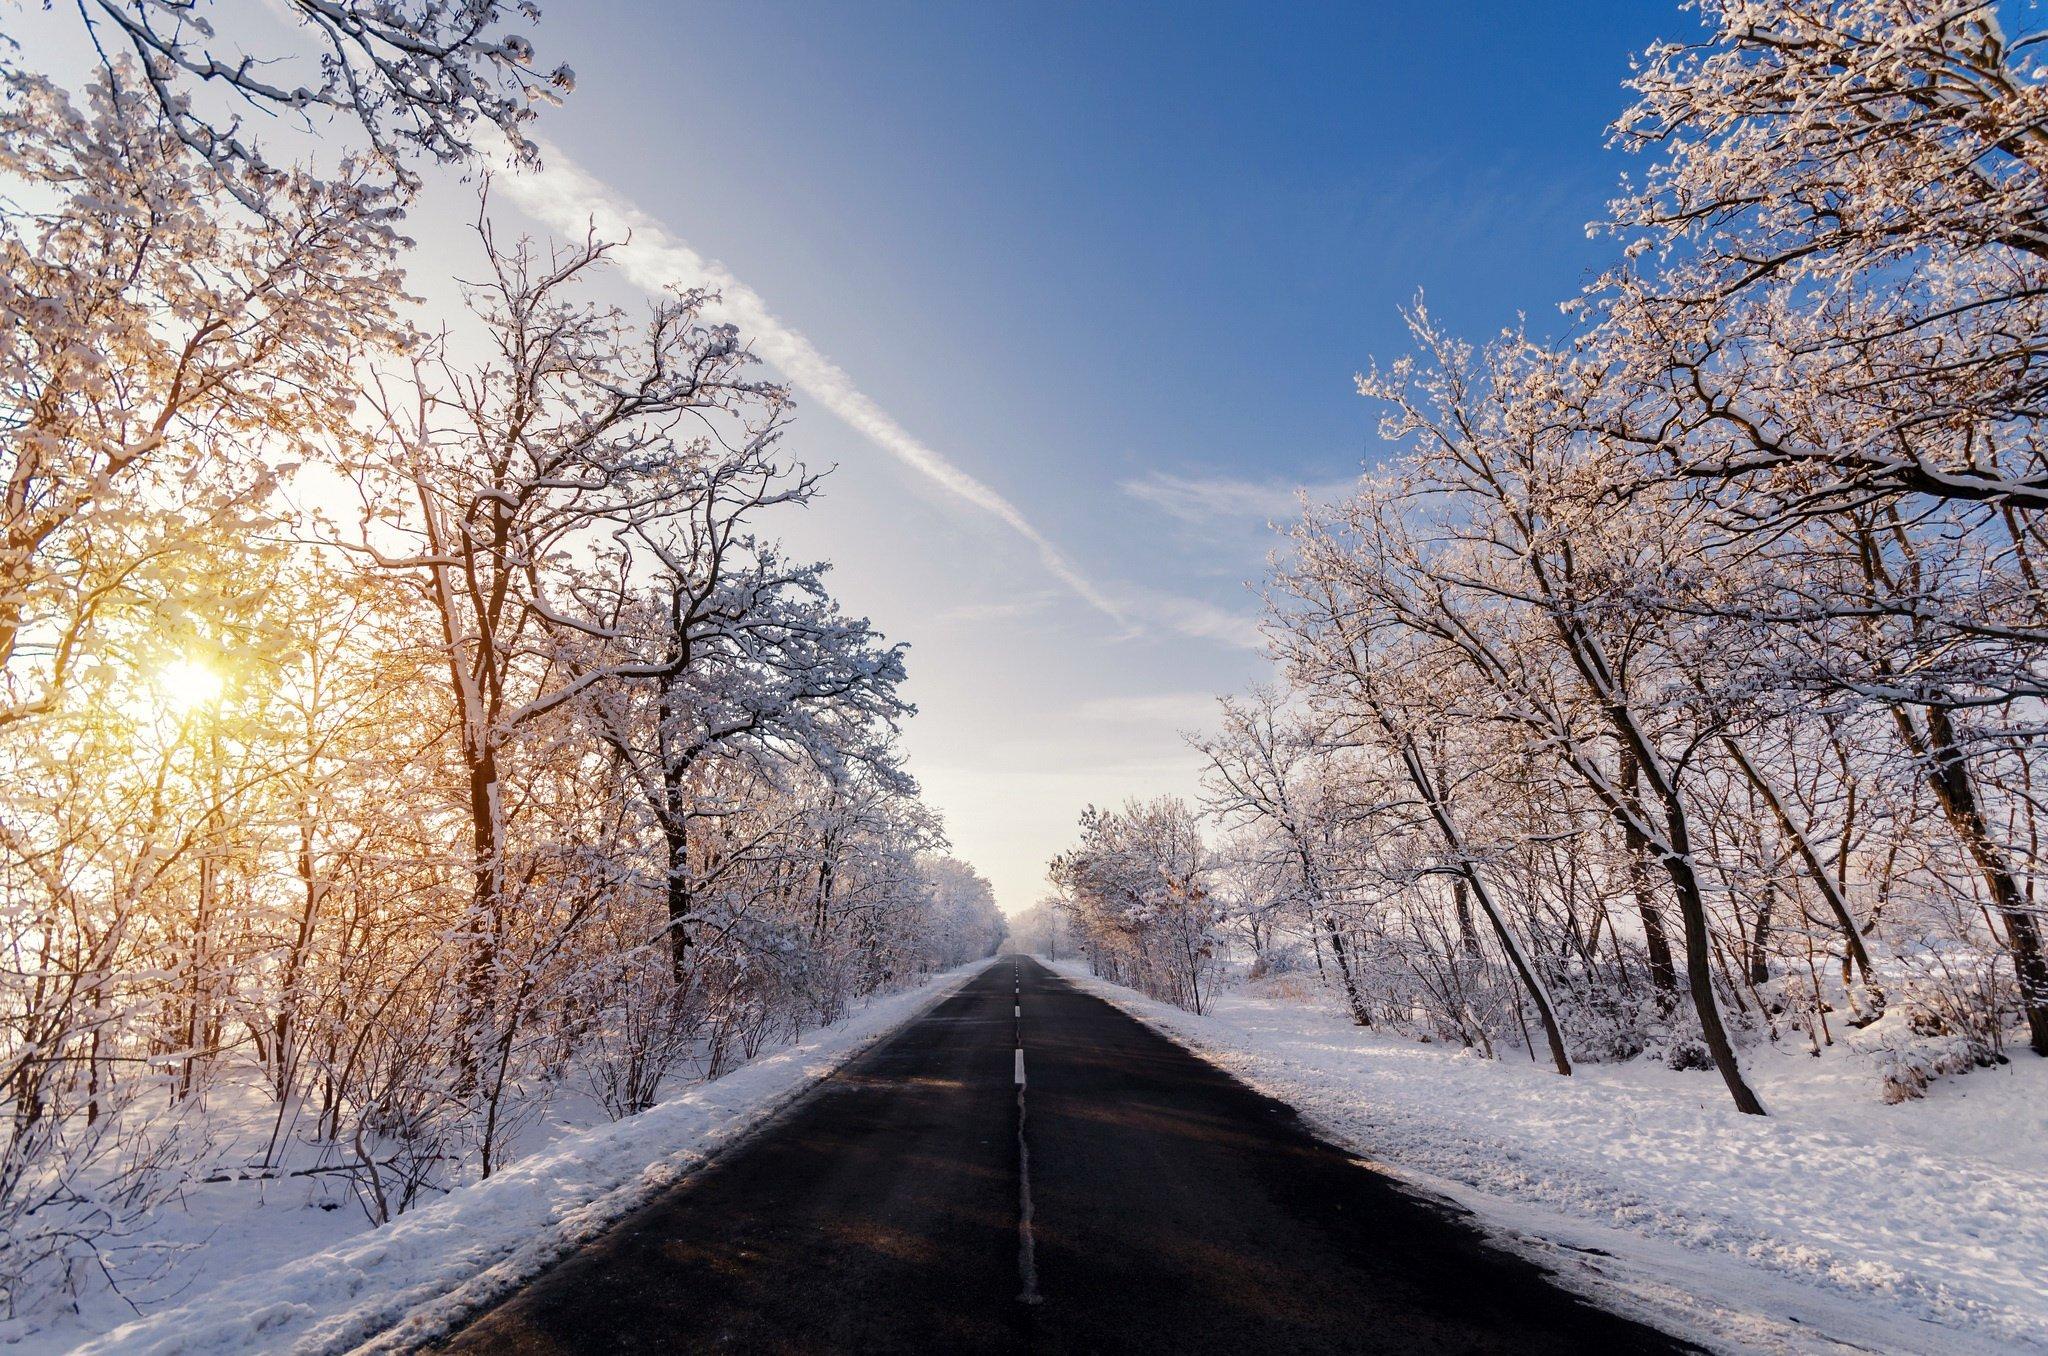 Road In Autumn Winter Wallpaper Id3814